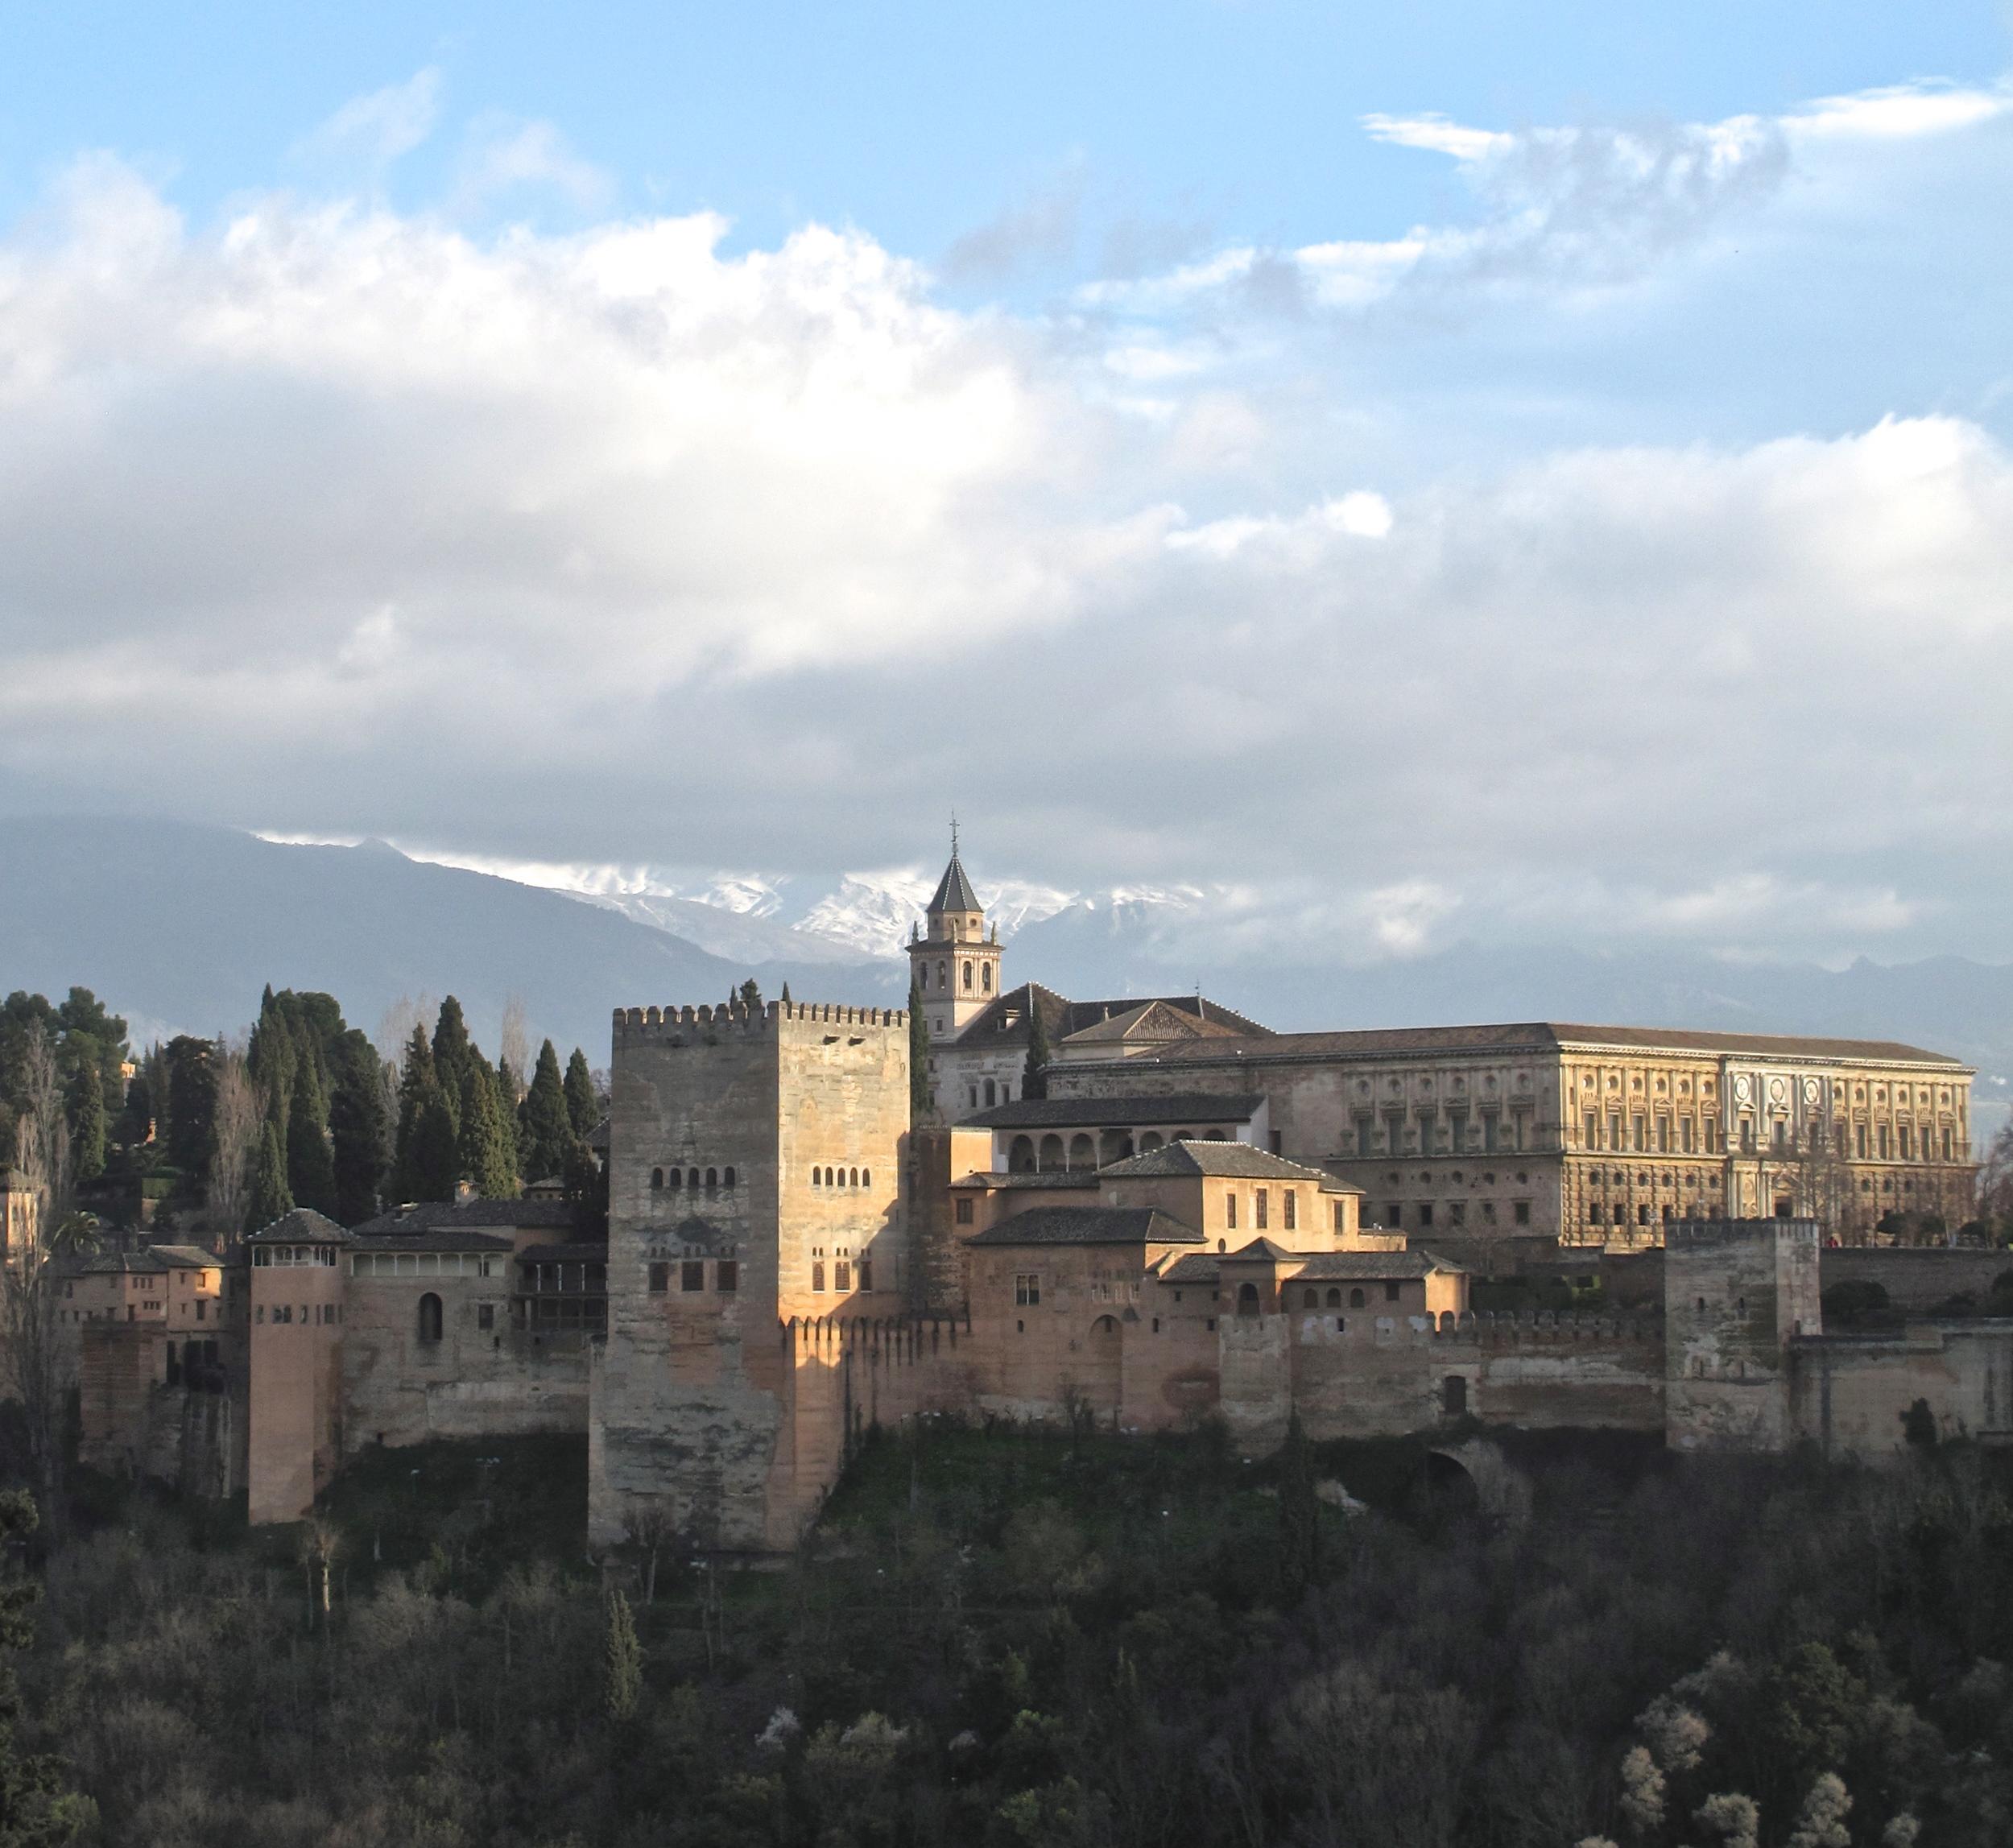 The alhambra - medieval muslim castles under a blue sky